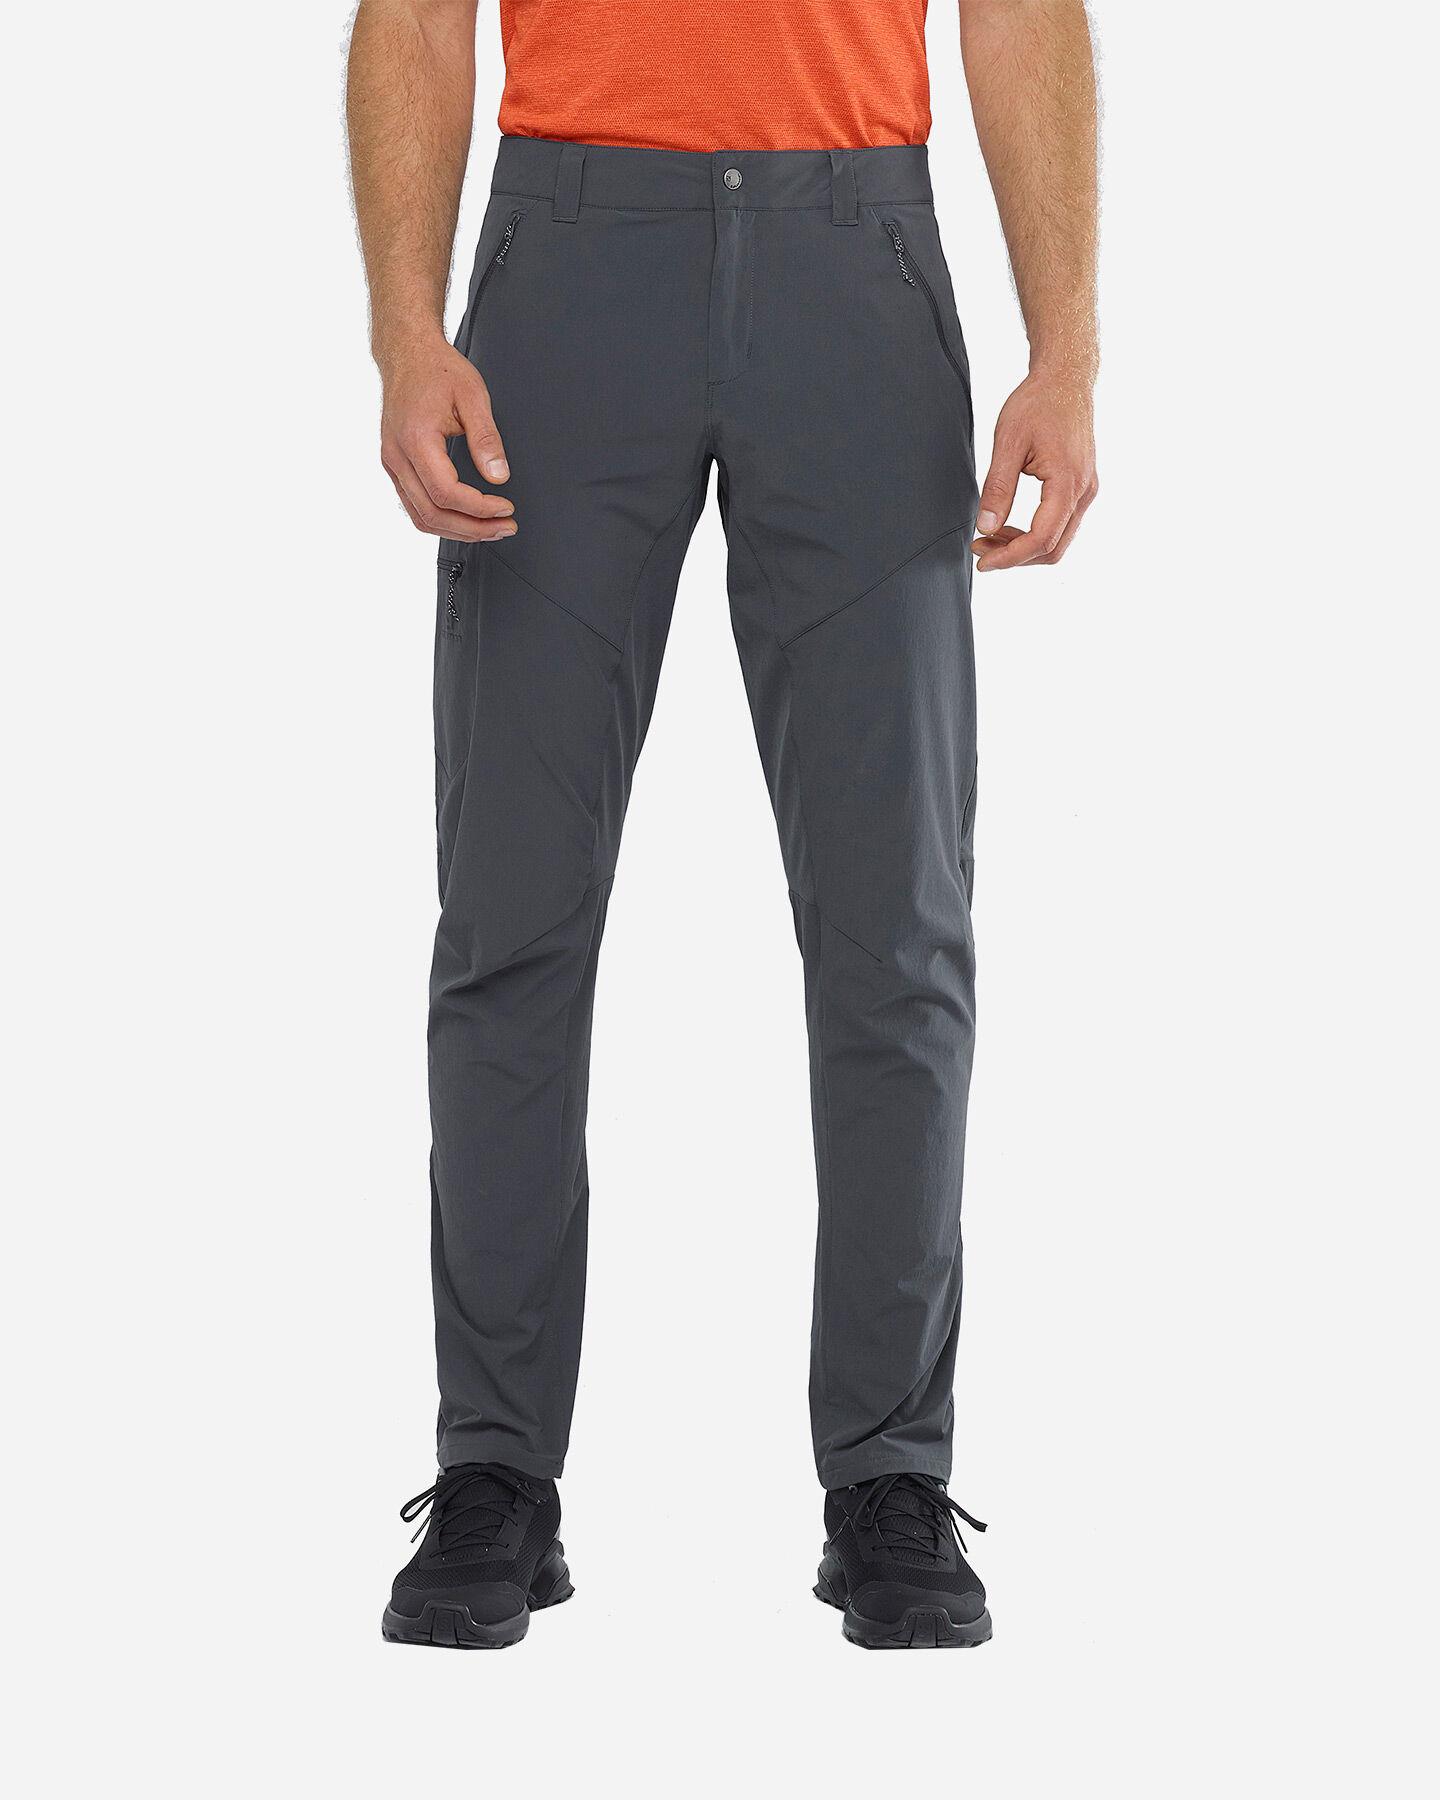 Pantalone outdoor SALOMON WAYFARER M S5173871 scatto 3